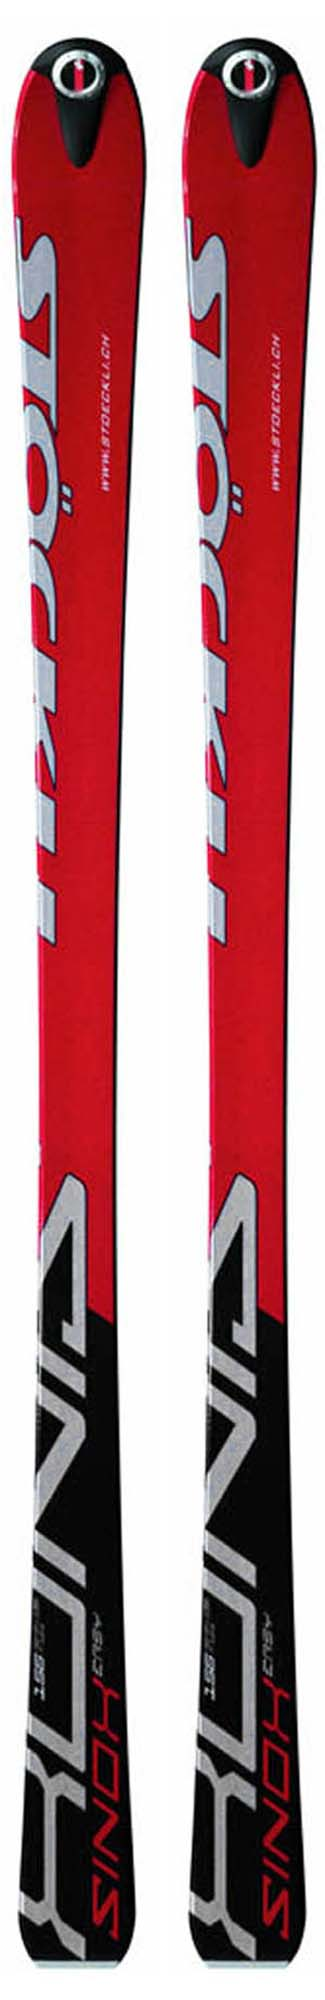 Stockli 2005 Sinox Easy Skis (No Bindings / Flat) NEW !! 164cm